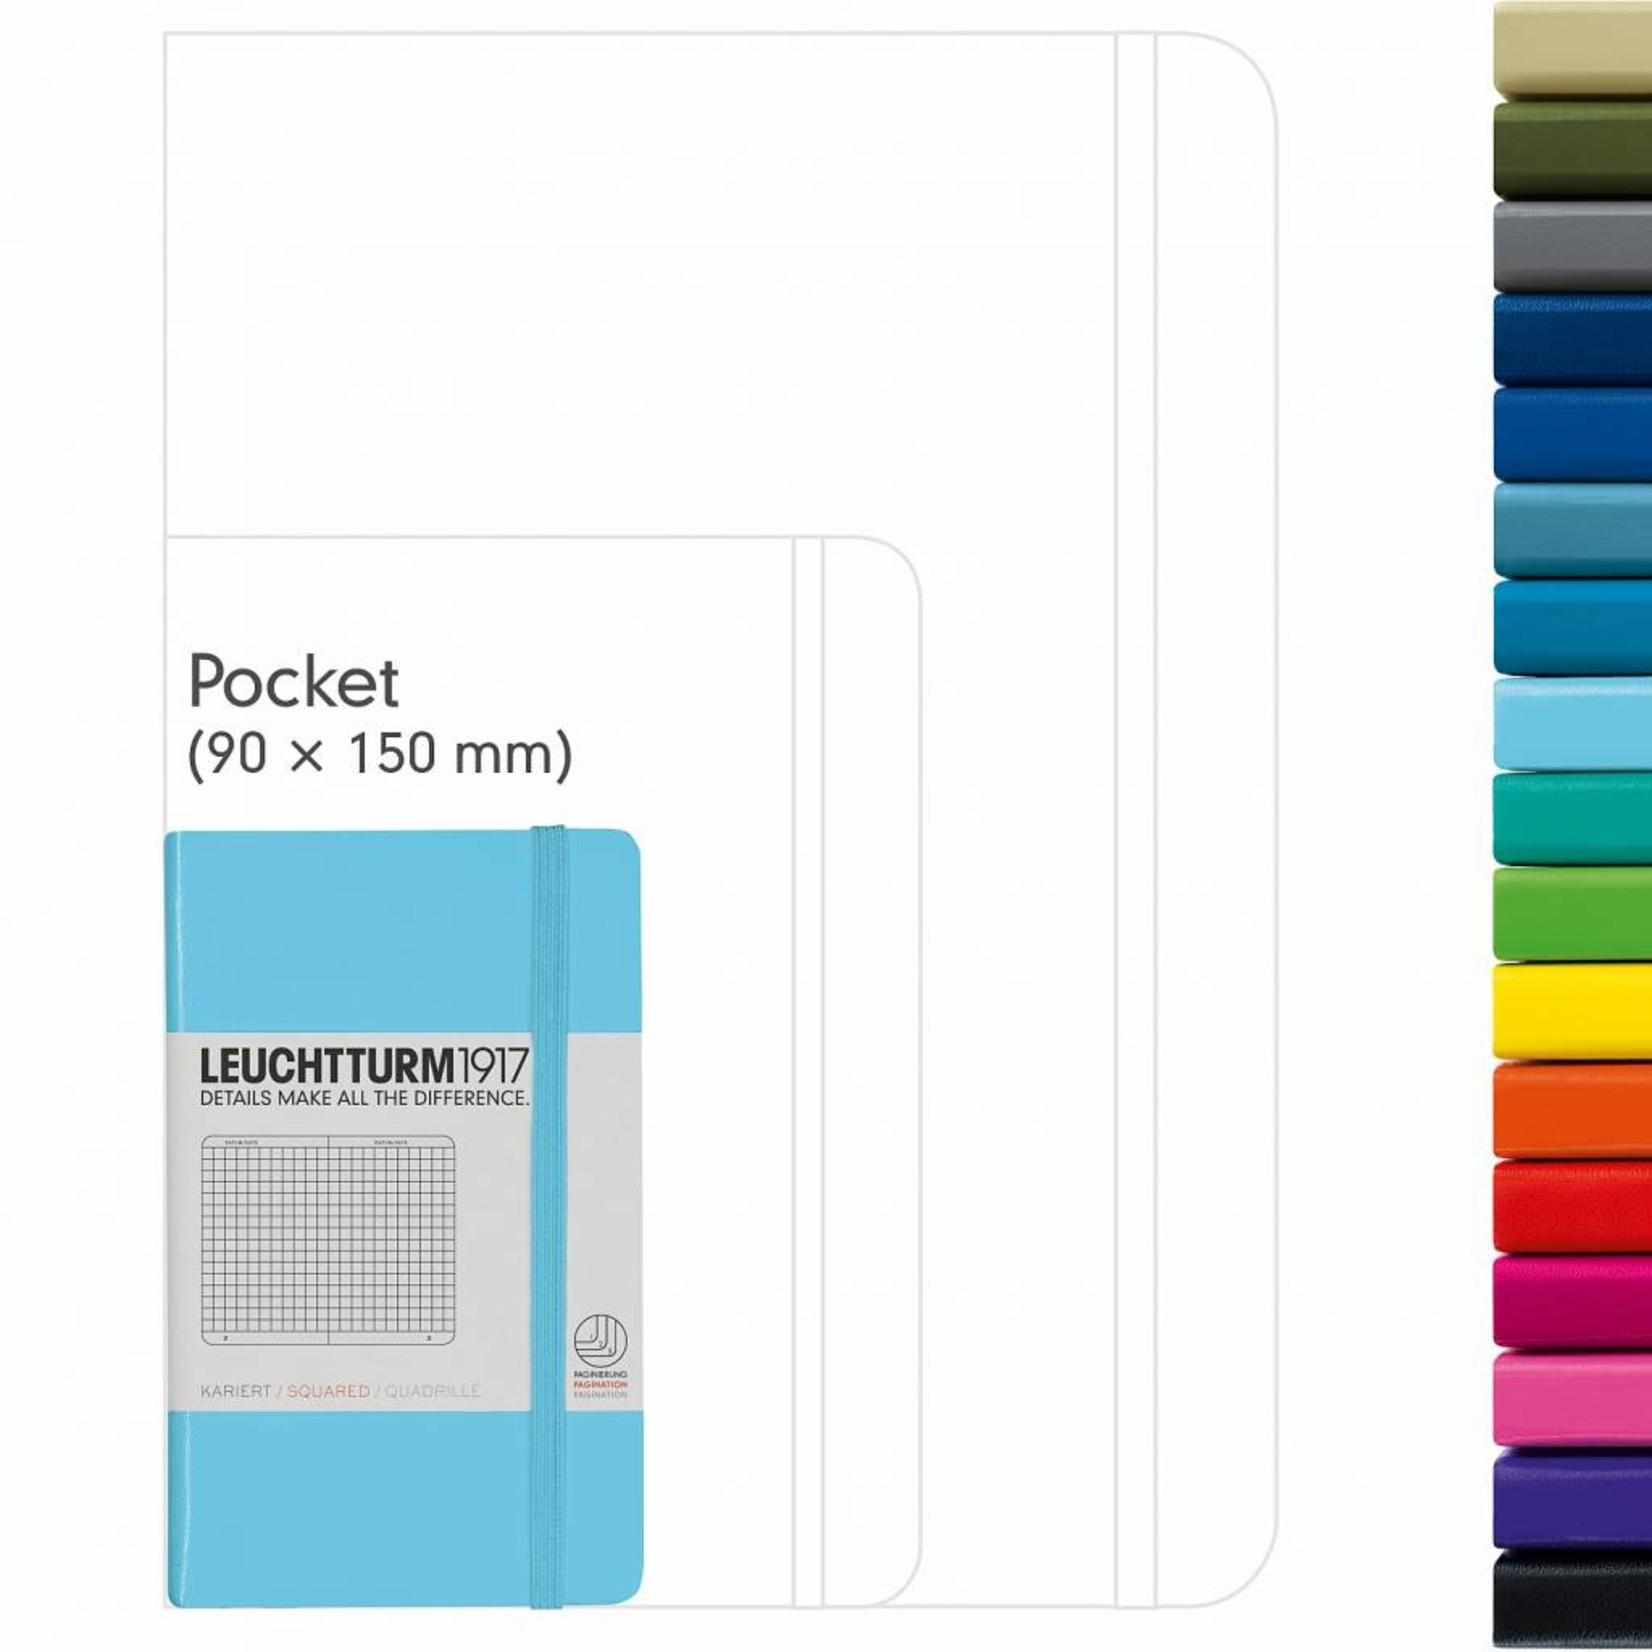 Leuchtturm1917 Leuchtturm1917 Notizbuch, Pocket, Smaragd, Dotted